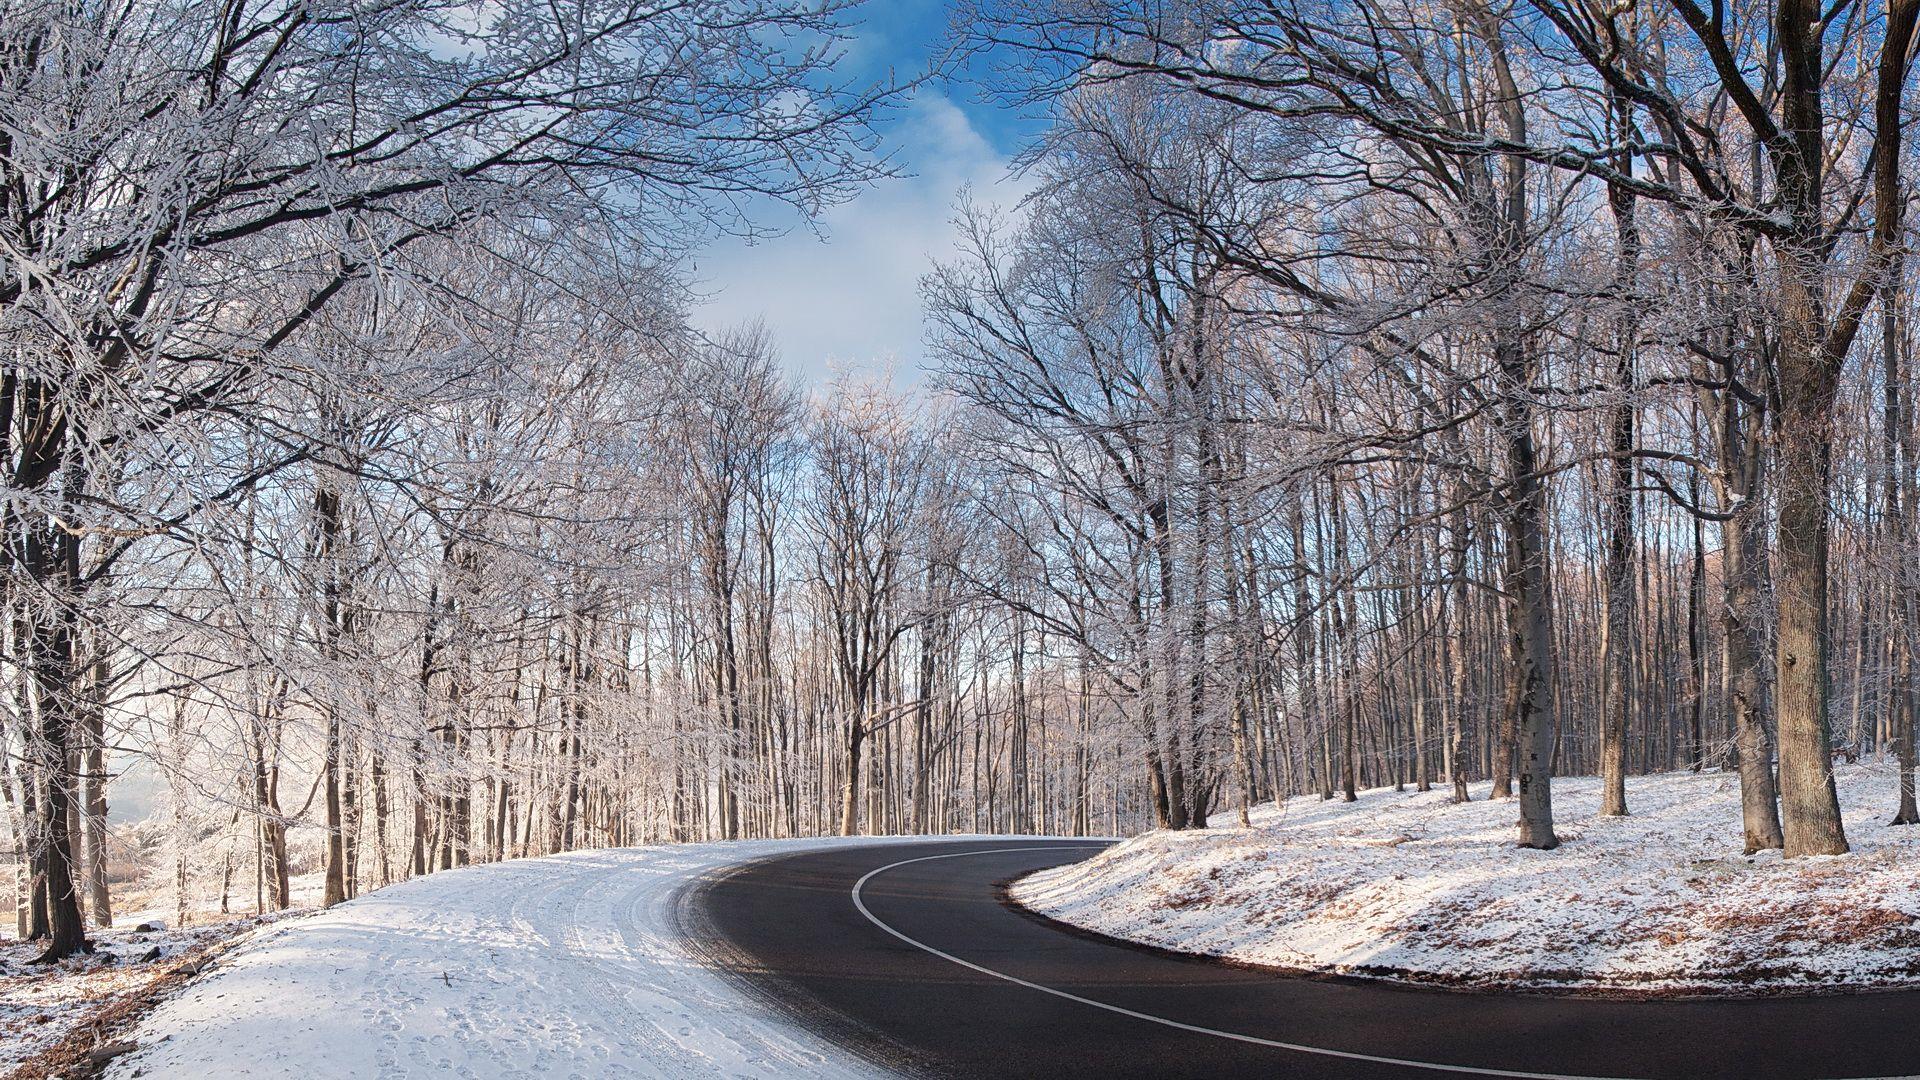 Snowy Bended Road Hd Wallpaper Fullhdwpp Full Hd Wallpapers 1920x1080 Winter Road Winter Scenes National Parks Hd wallpaper snow winter road asphalt